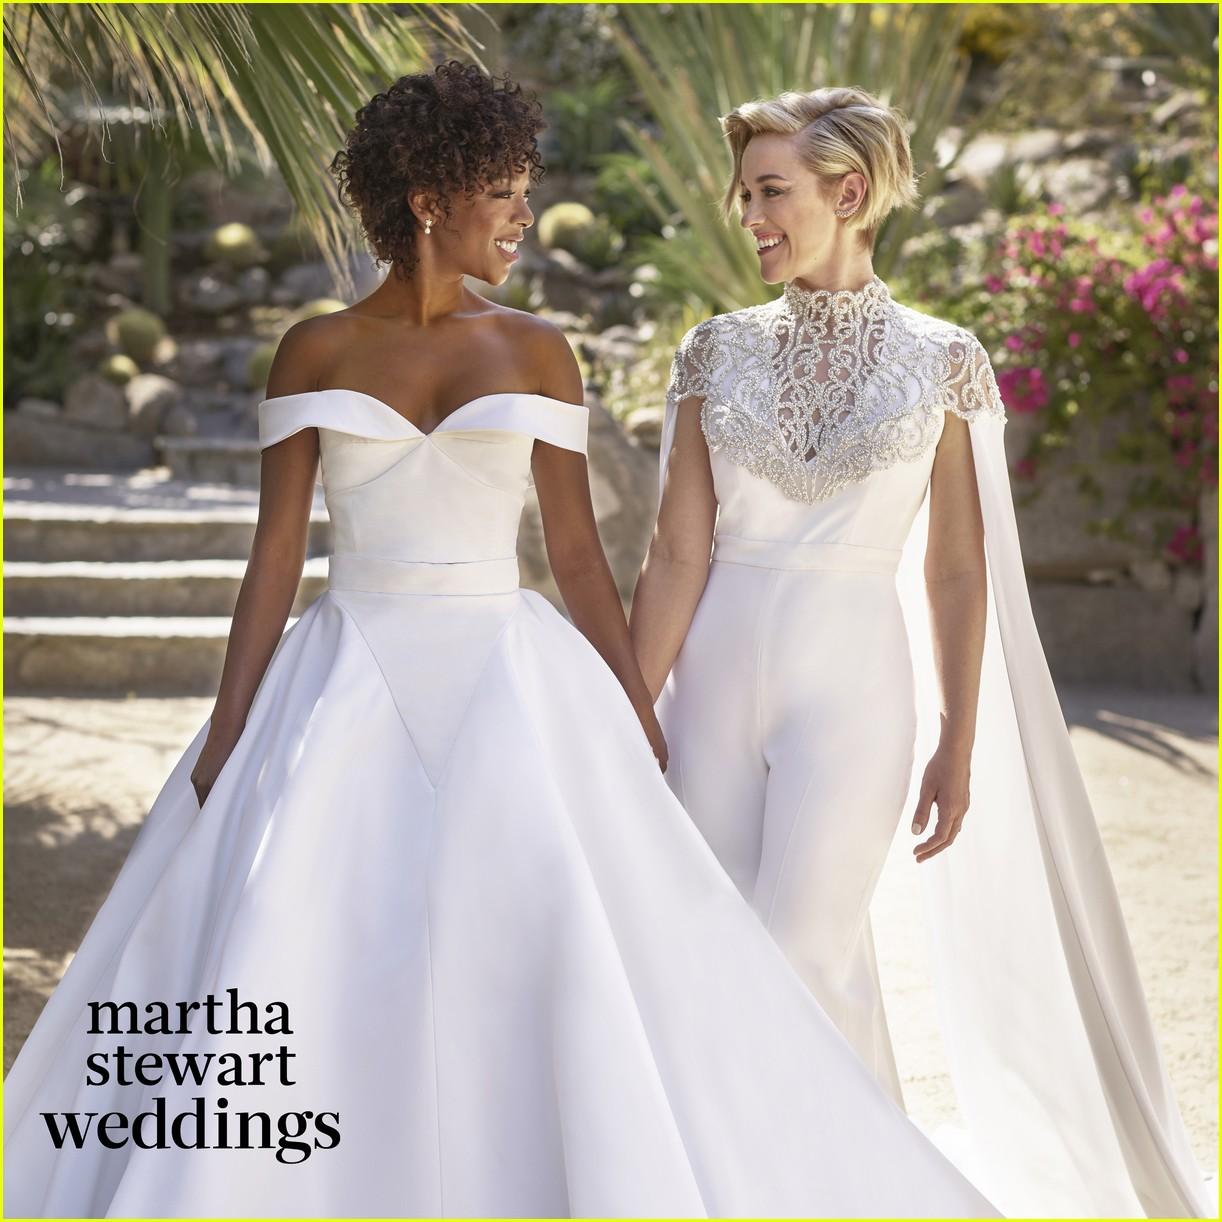 Full Sized Photo Of Samira Wiley Lauren Married Wedding Photos 01